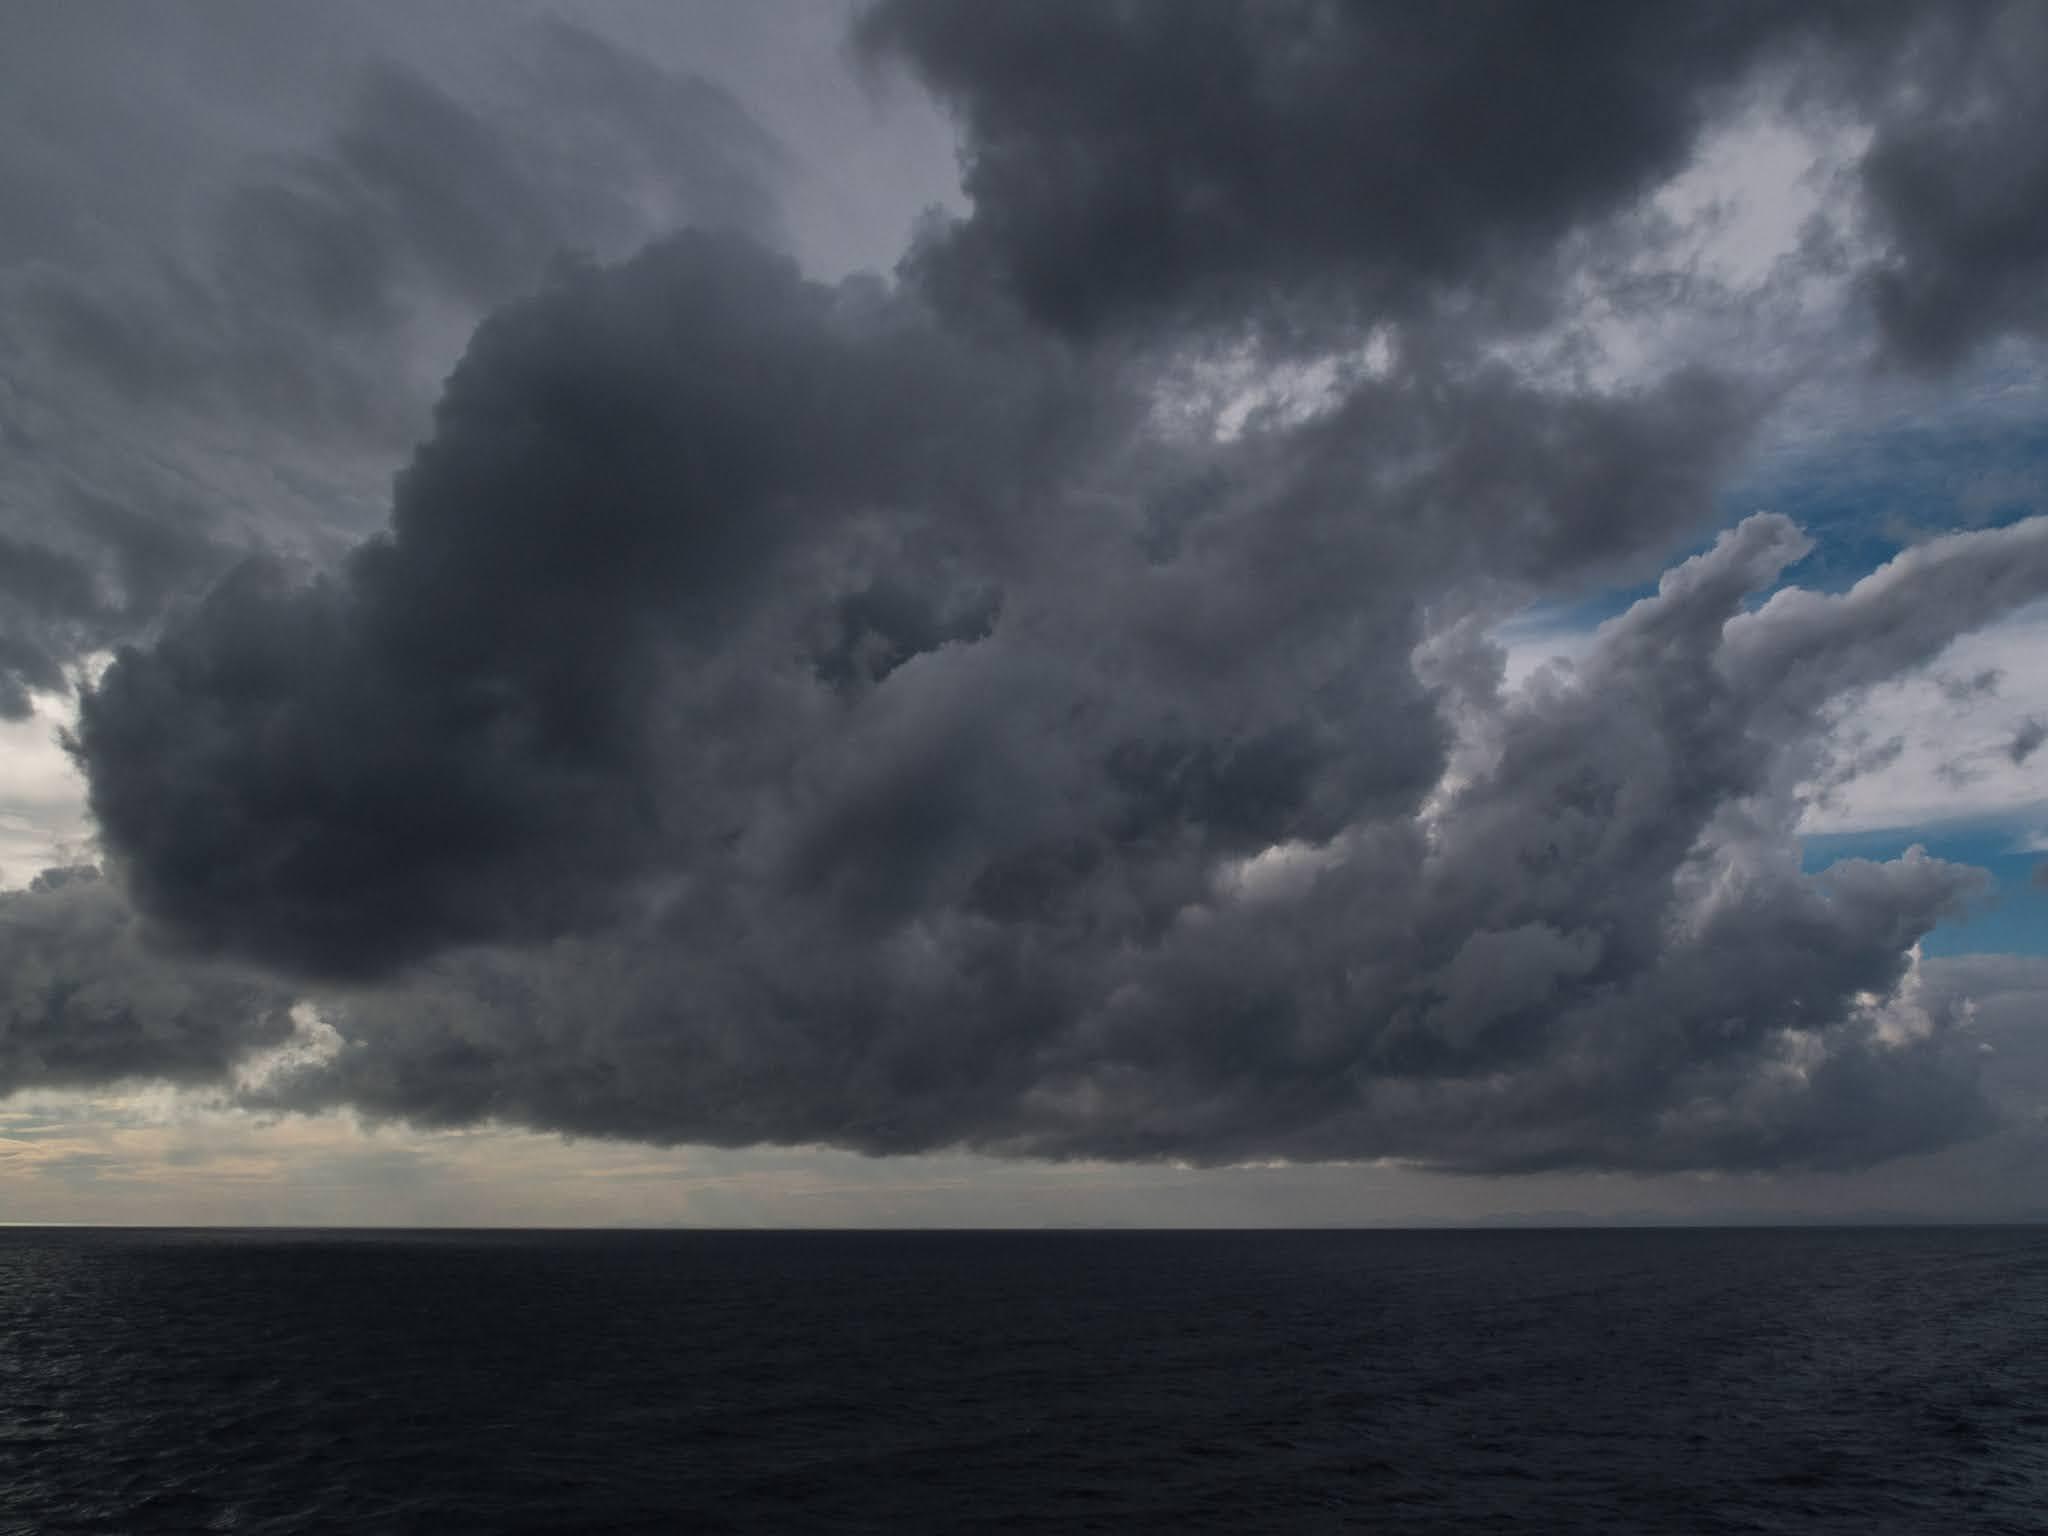 Dramatic sky over the Mediterranean Sea